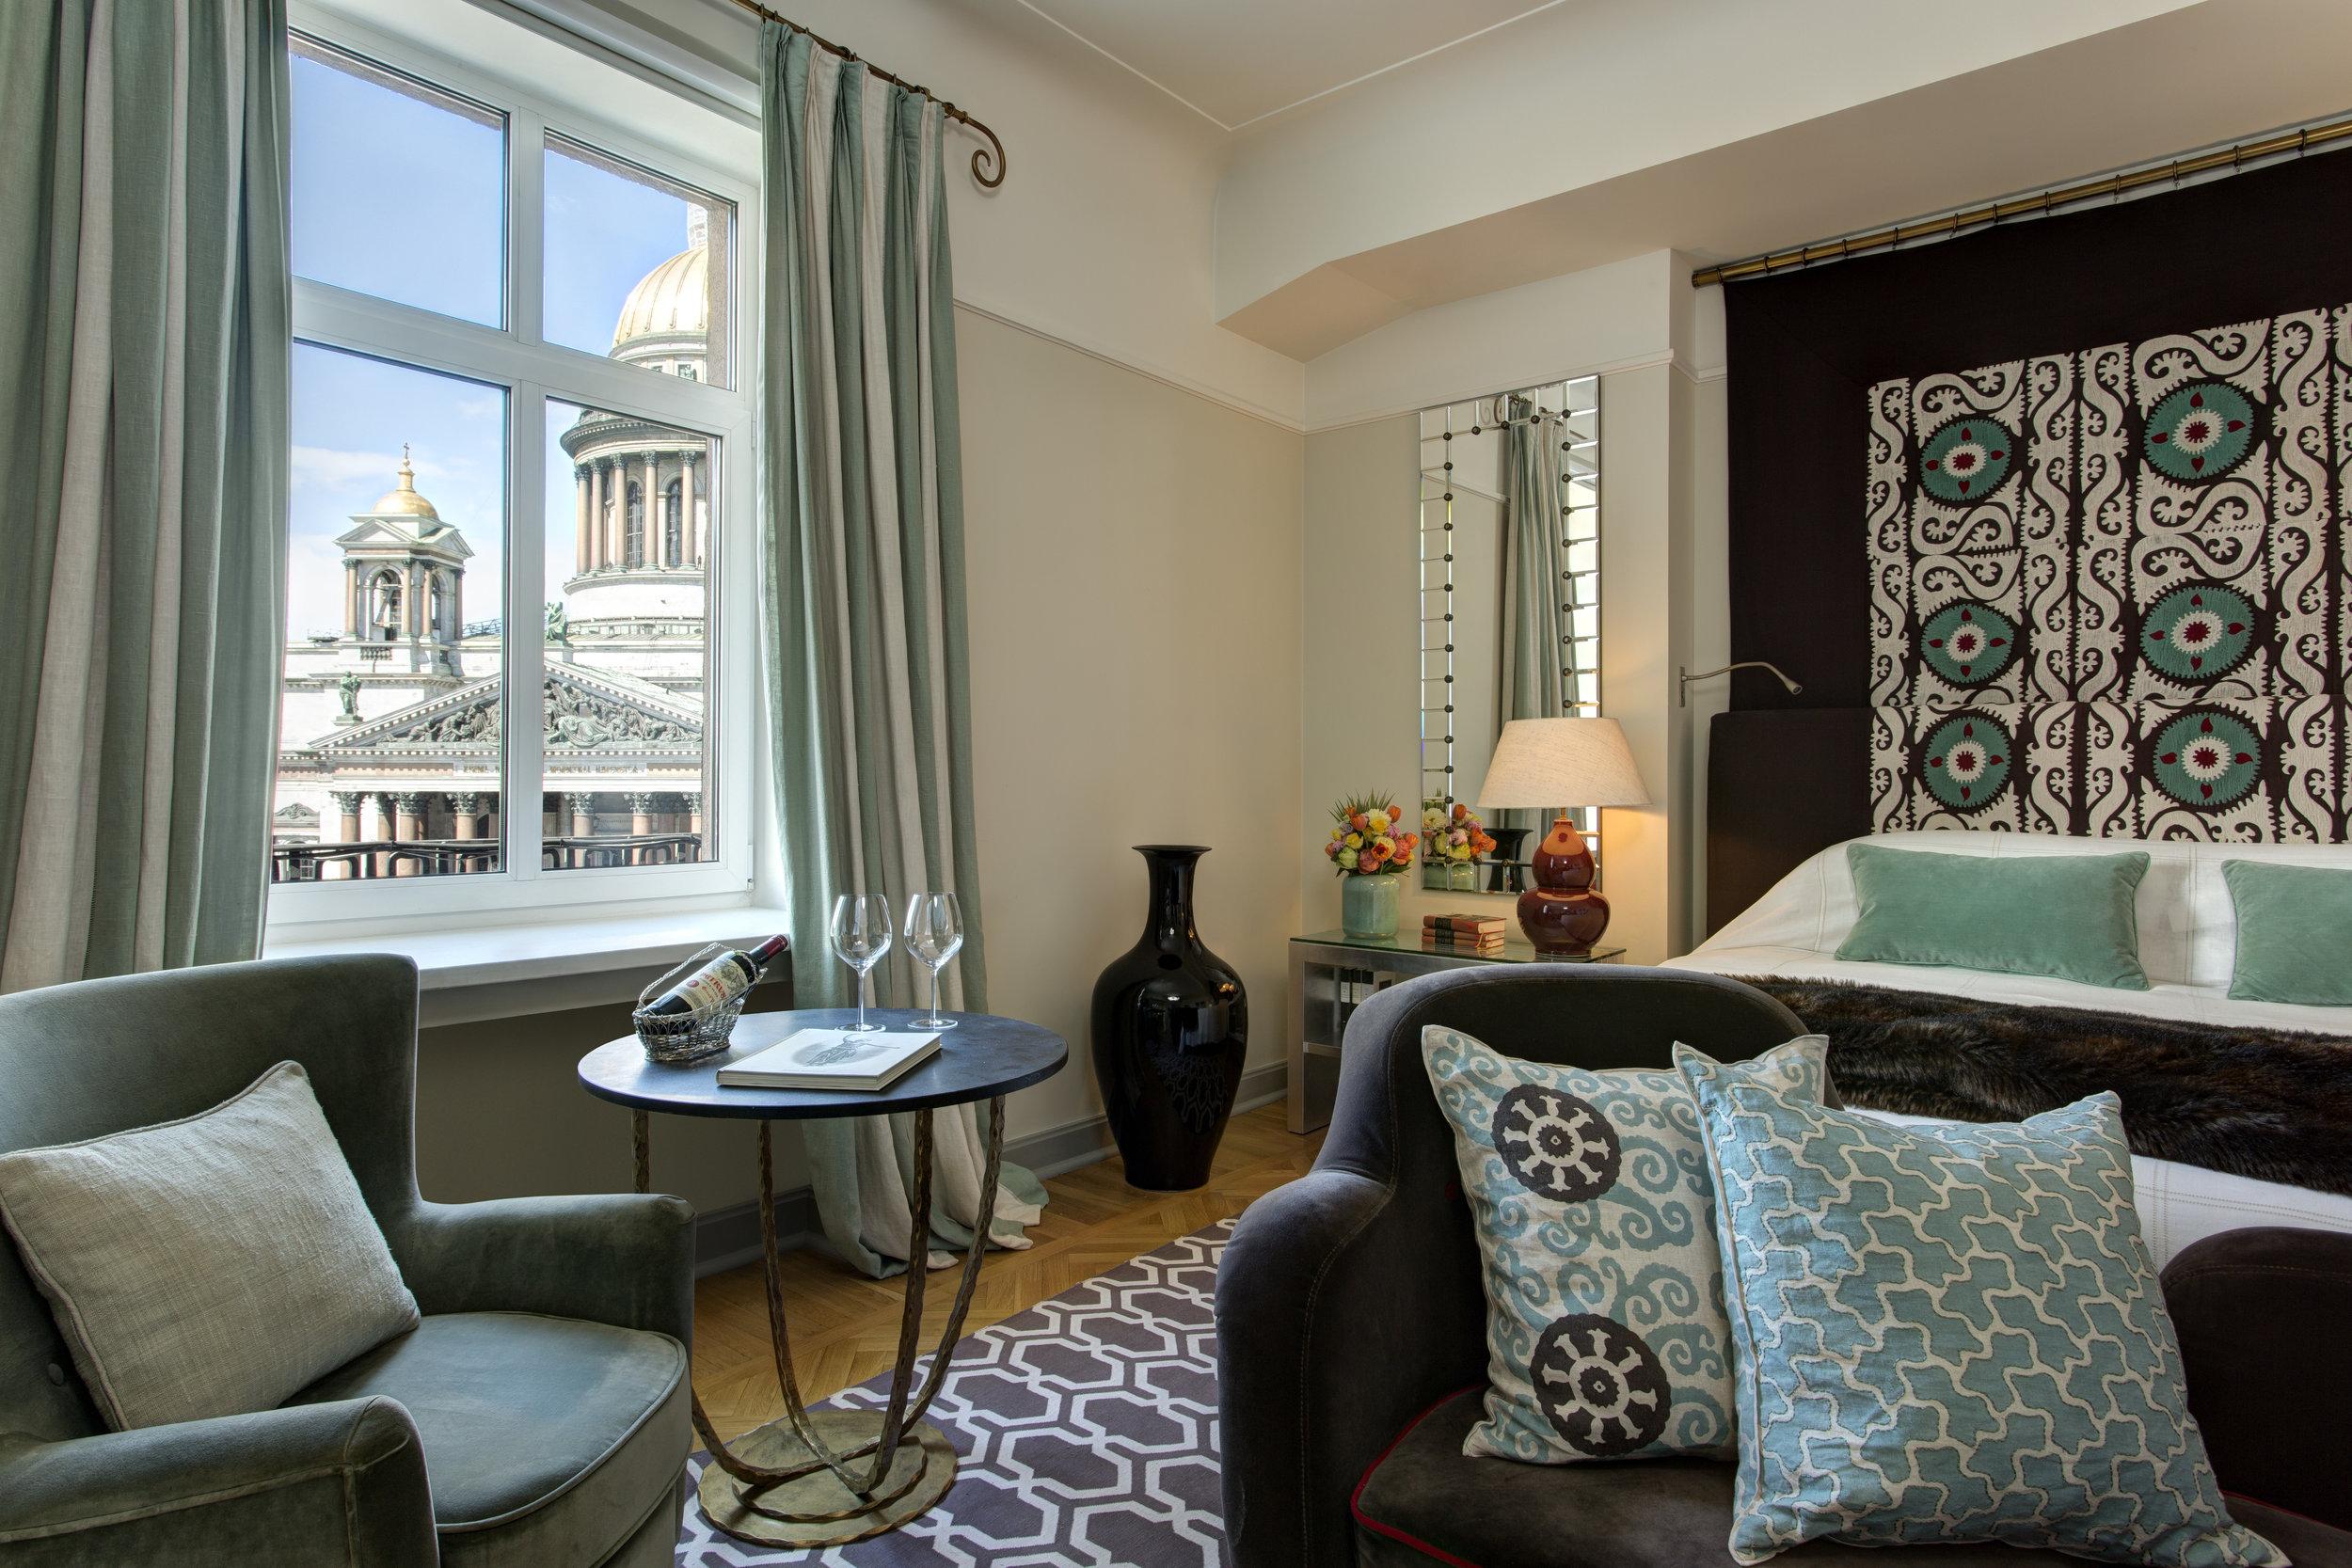 11 RFH Hotel Astoria - Tsar Suite 7964.JPG